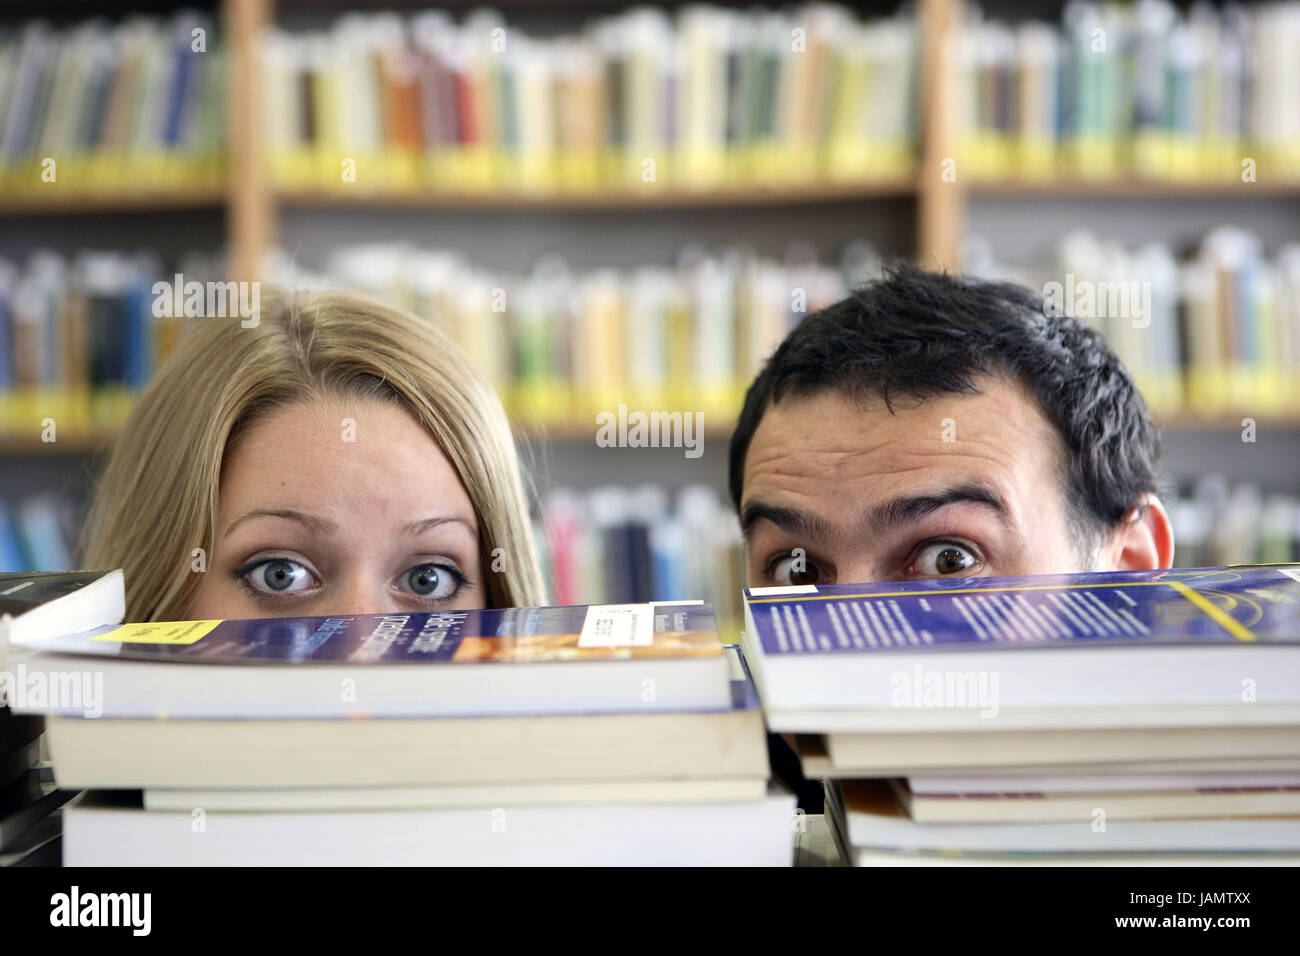 University,library,student,couple,book batch,hervorspähen,portrait,detail,ocular match,uncertainly,anxiously,lend,stacked - Stock Image